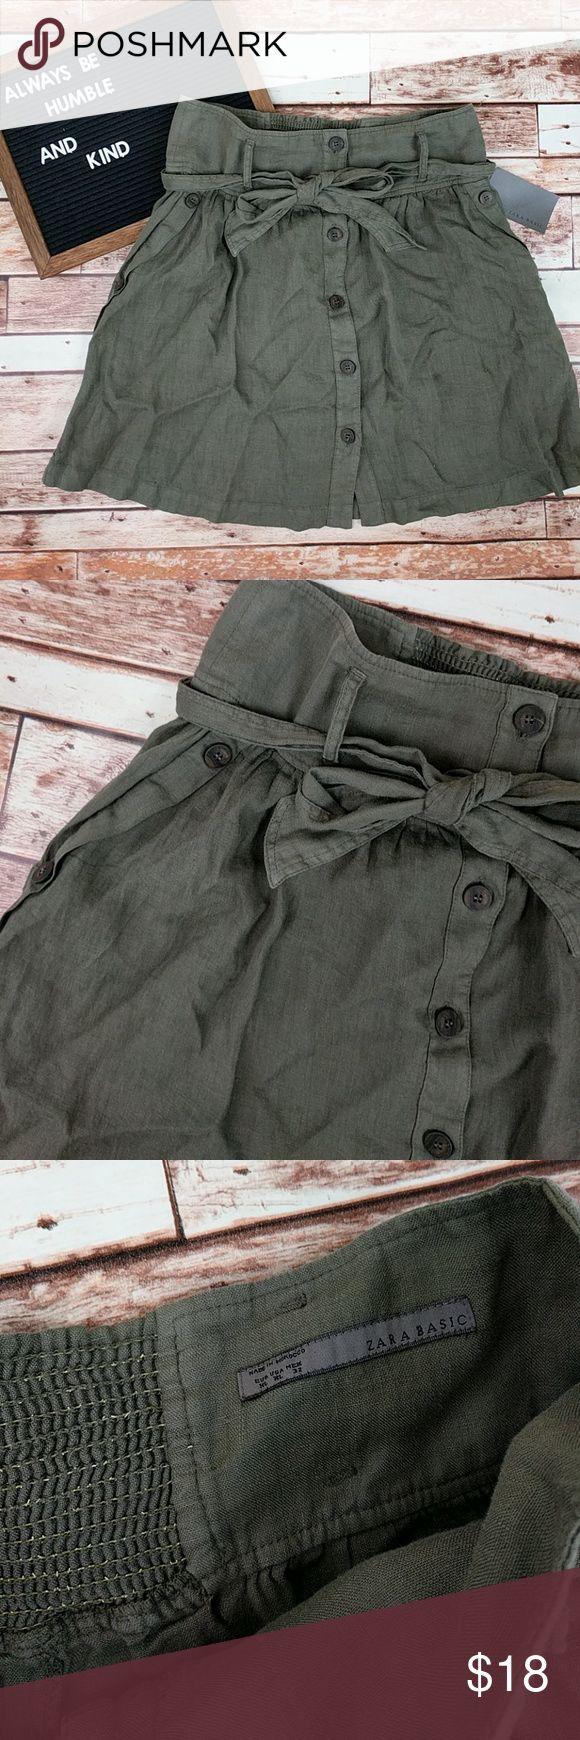 🆕 NWT Zara Linen Skirt NWT Zara Linen Skirt Size XL. Runs Small. Army Green. Zara Skirts